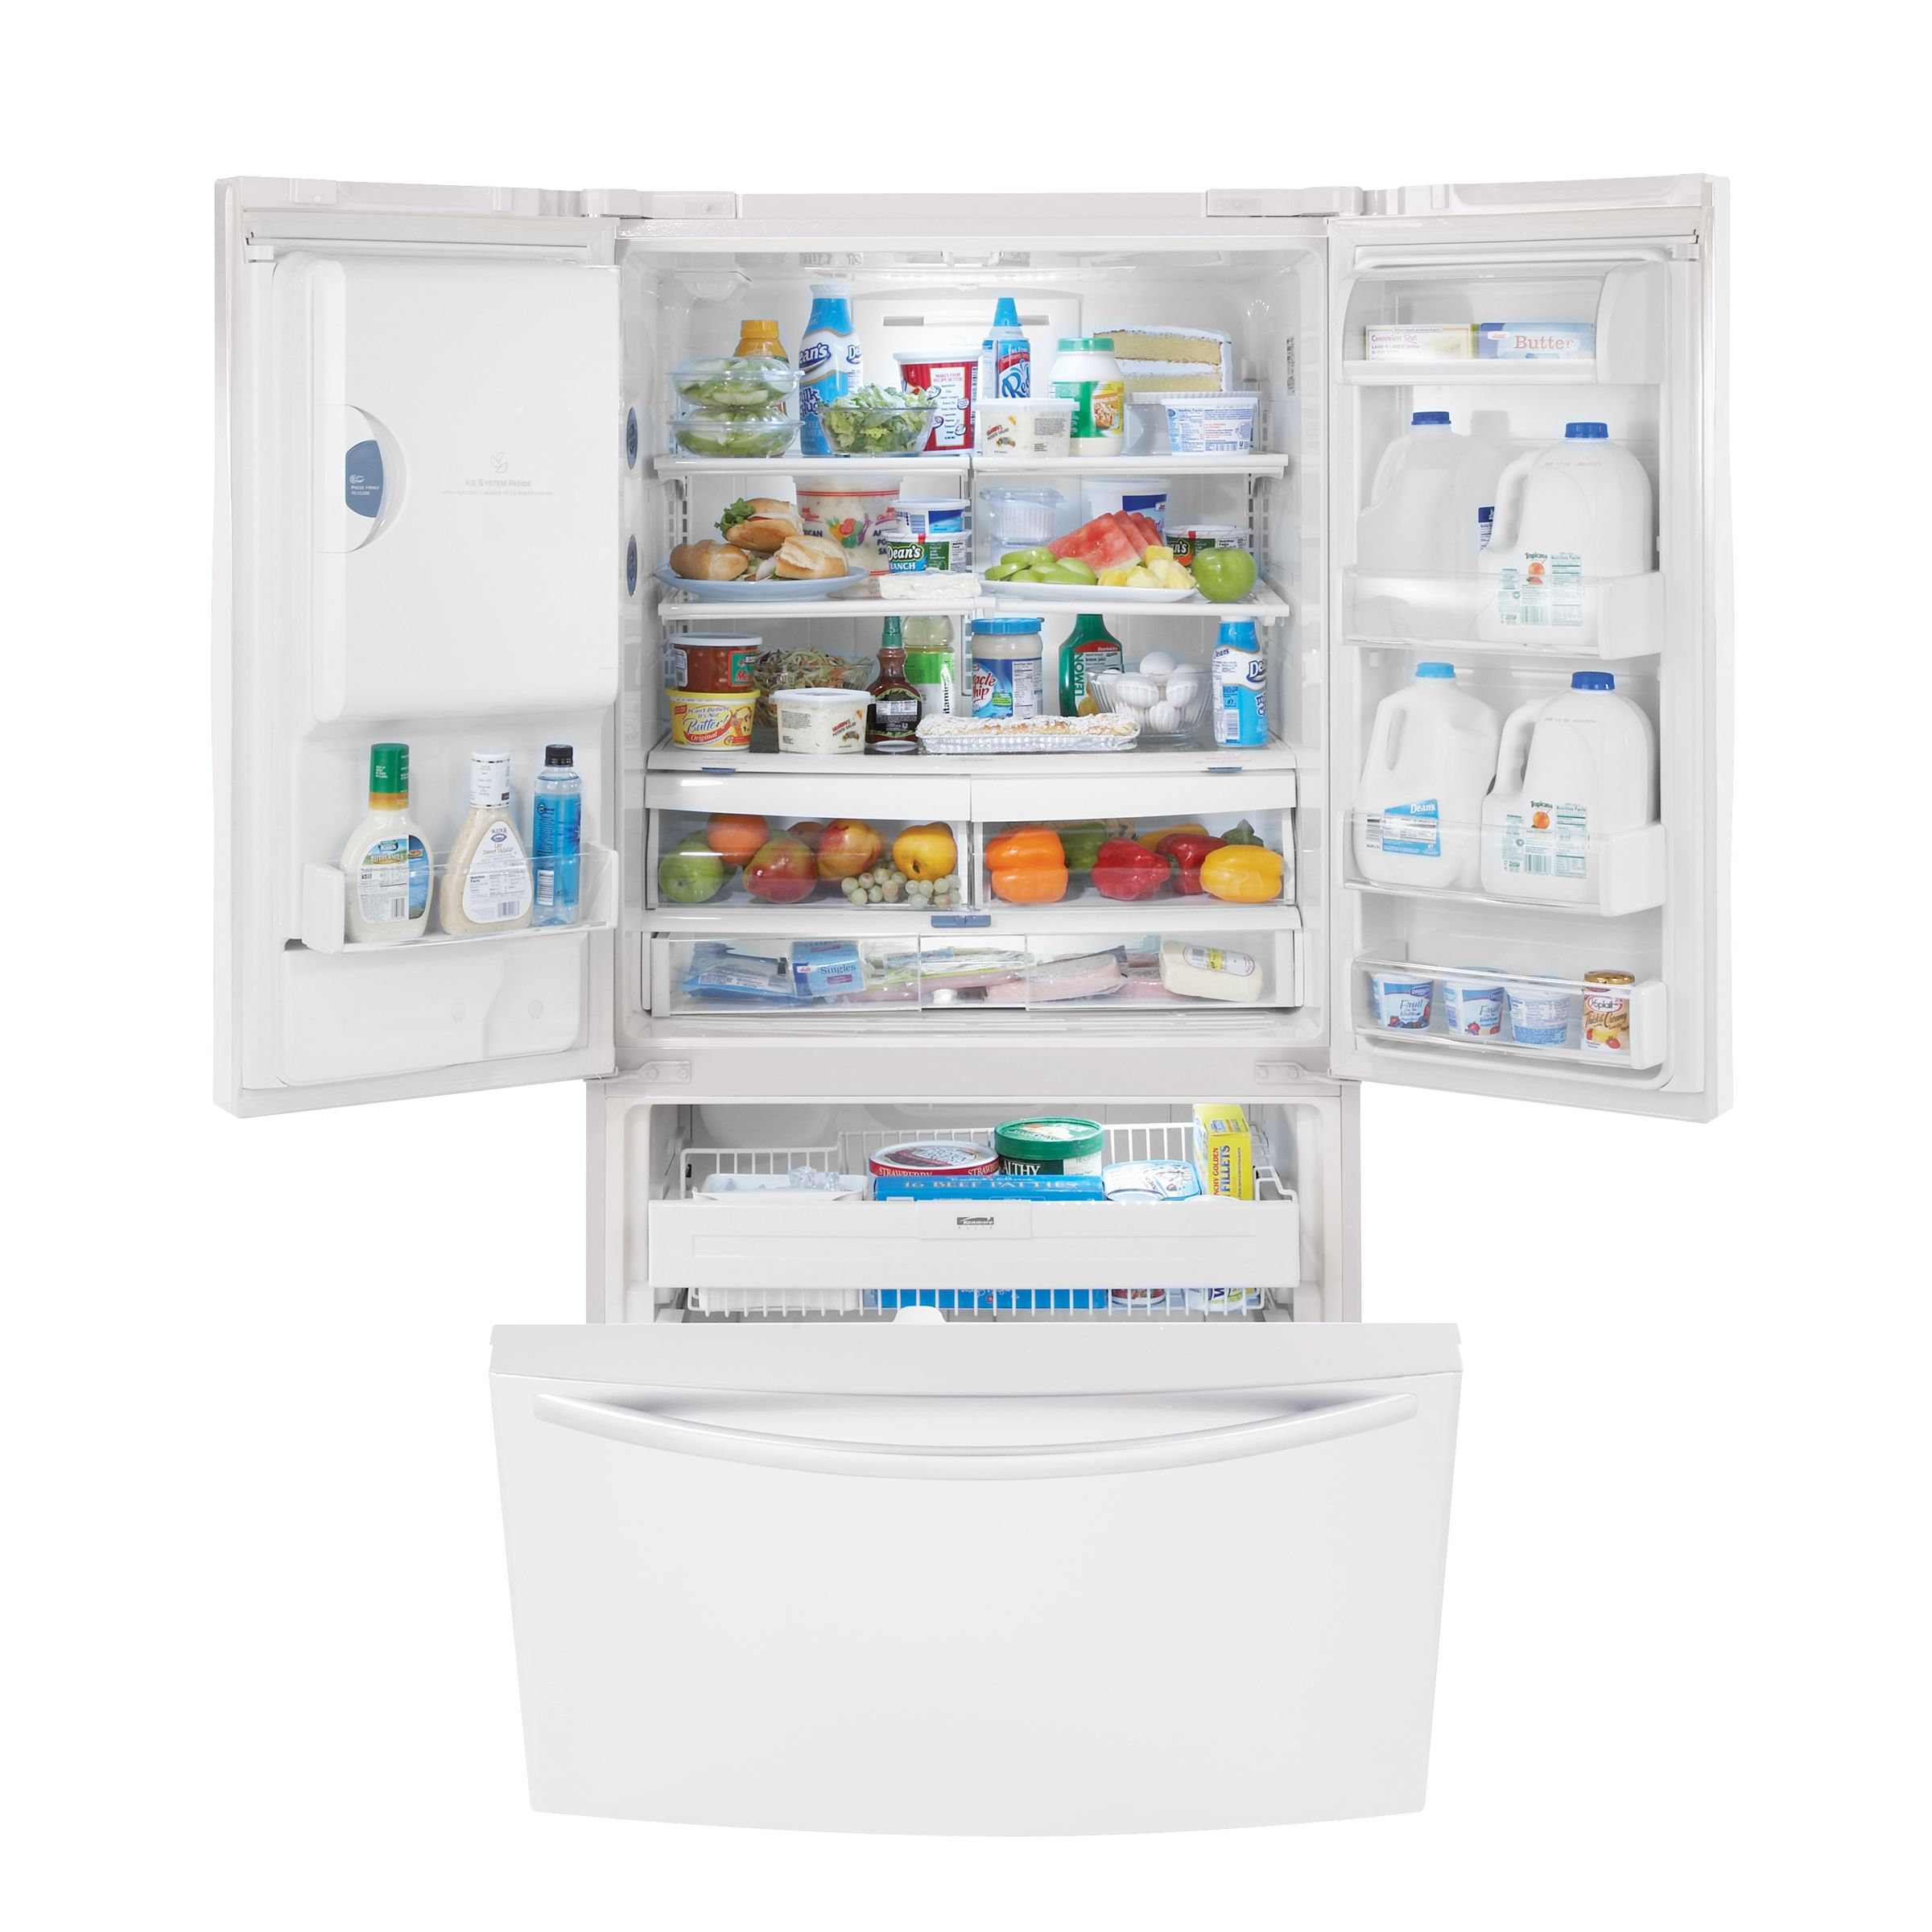 Kenmore Elite 25.0 cu. ft. TRIO® Ice & Water Dispensing French-Door Refrigerator